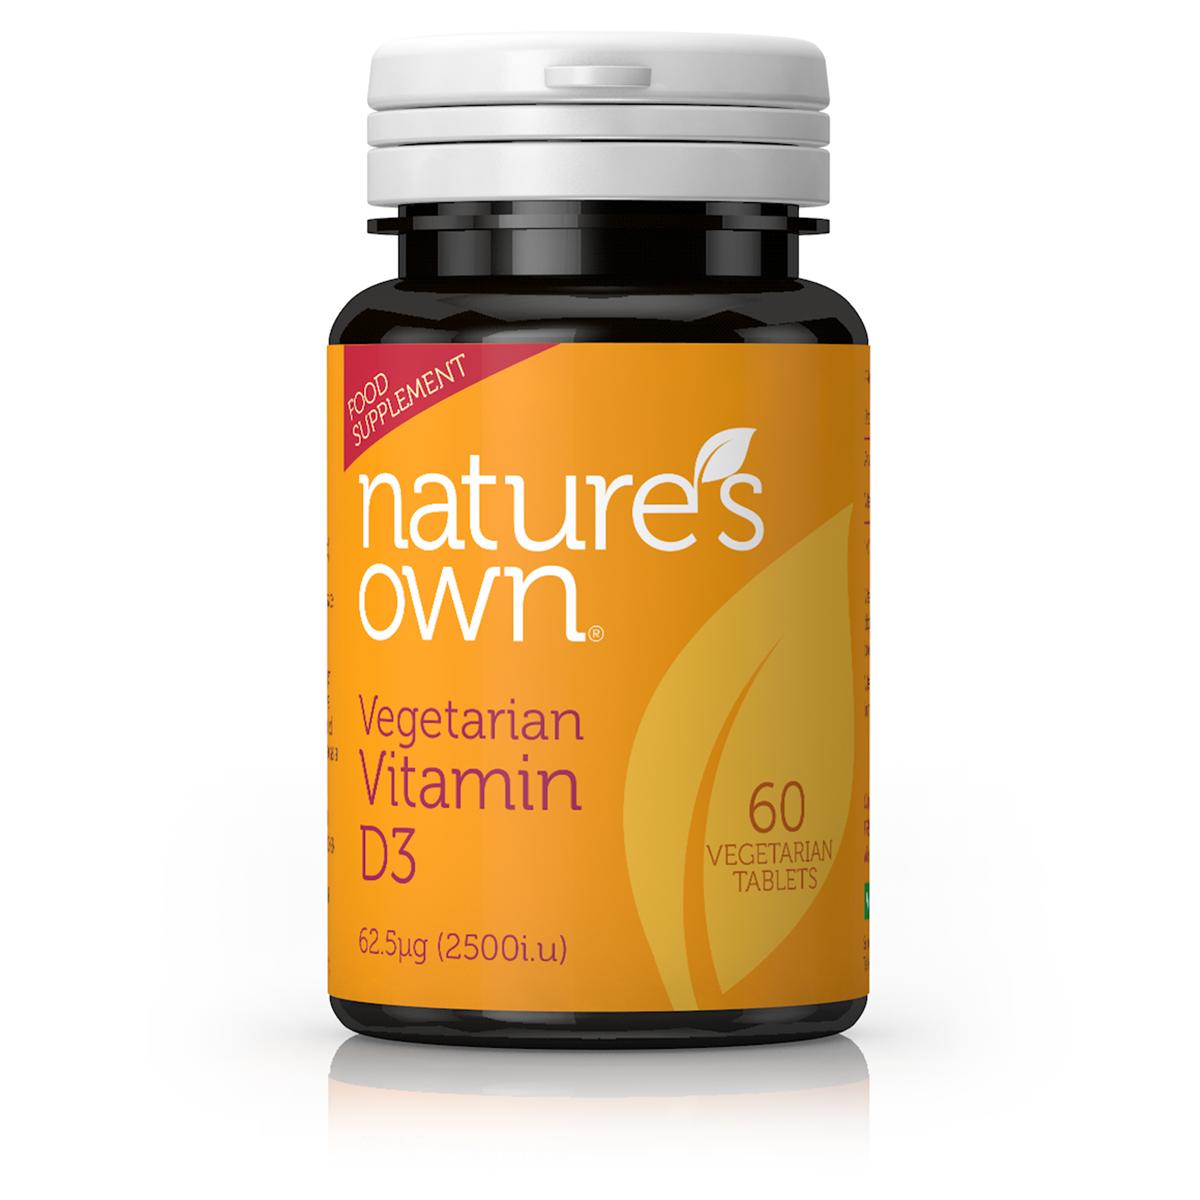 Vegetarian Vitamin D3 62.5ug 60's